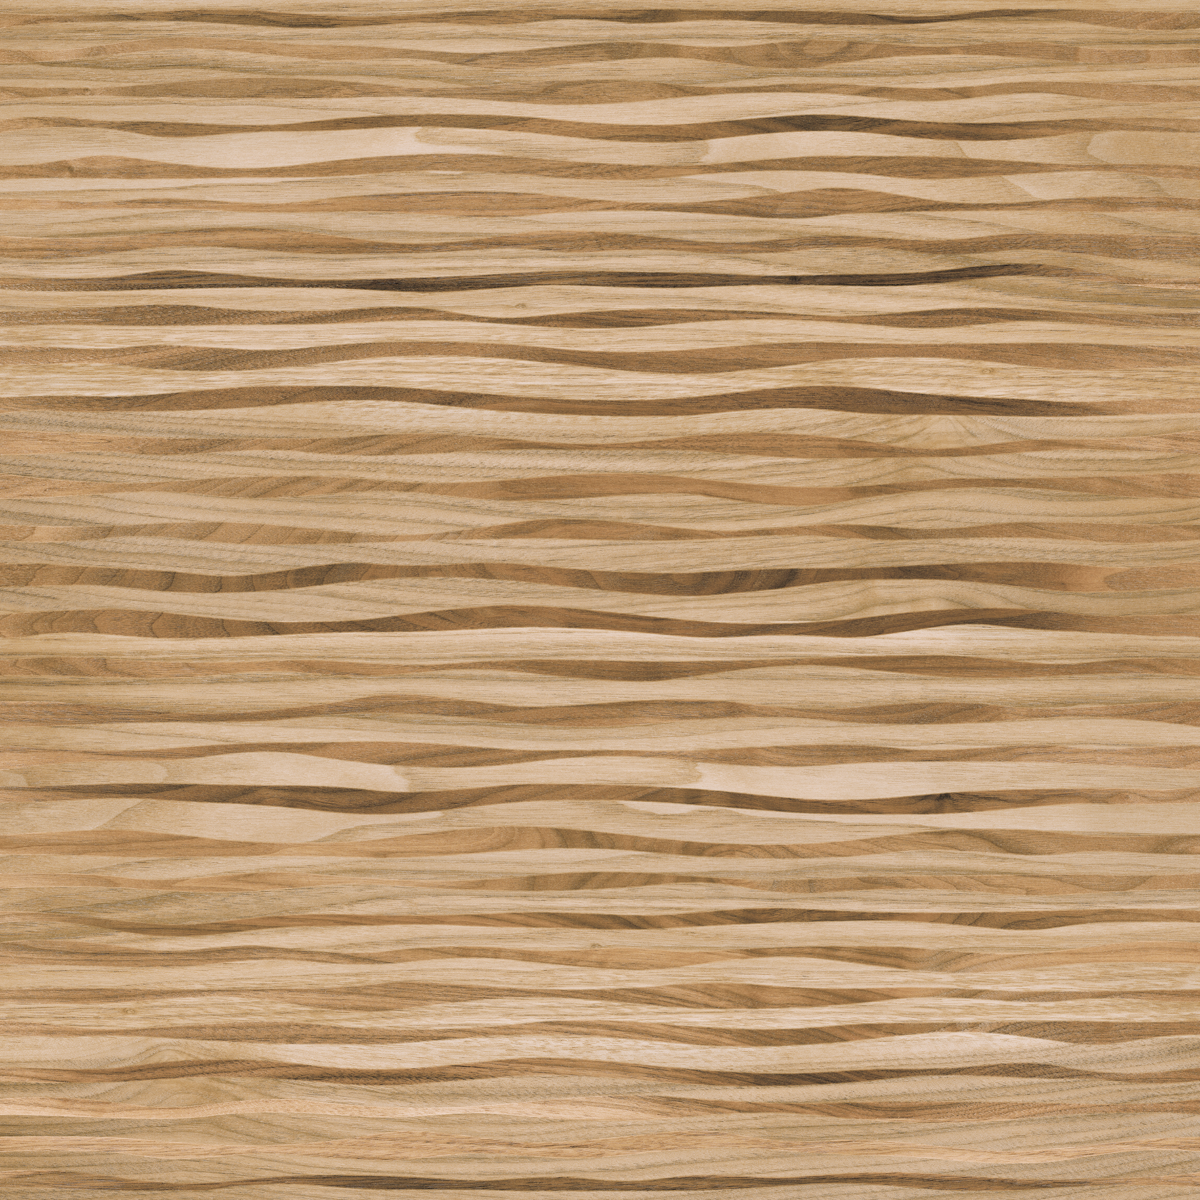 Portinari_Scene_Decor_BW_Product   Stiles Image